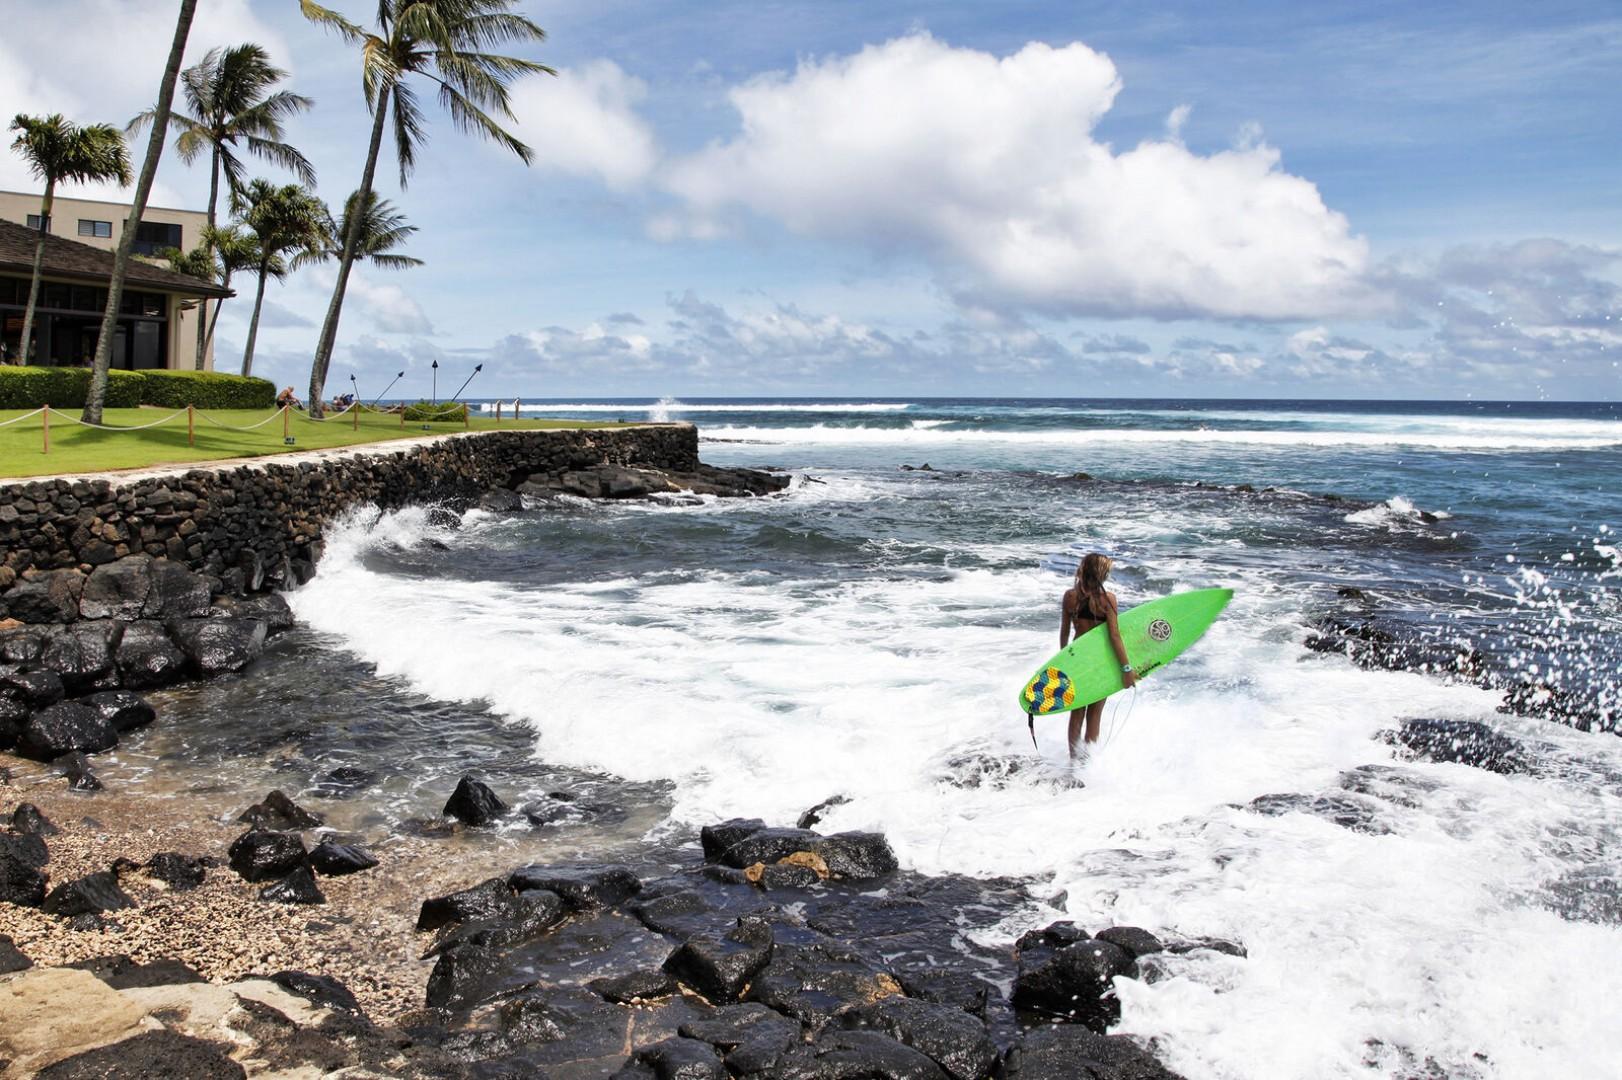 Prince Kuhio's (PK's) surf break fronting the beach house restaurant